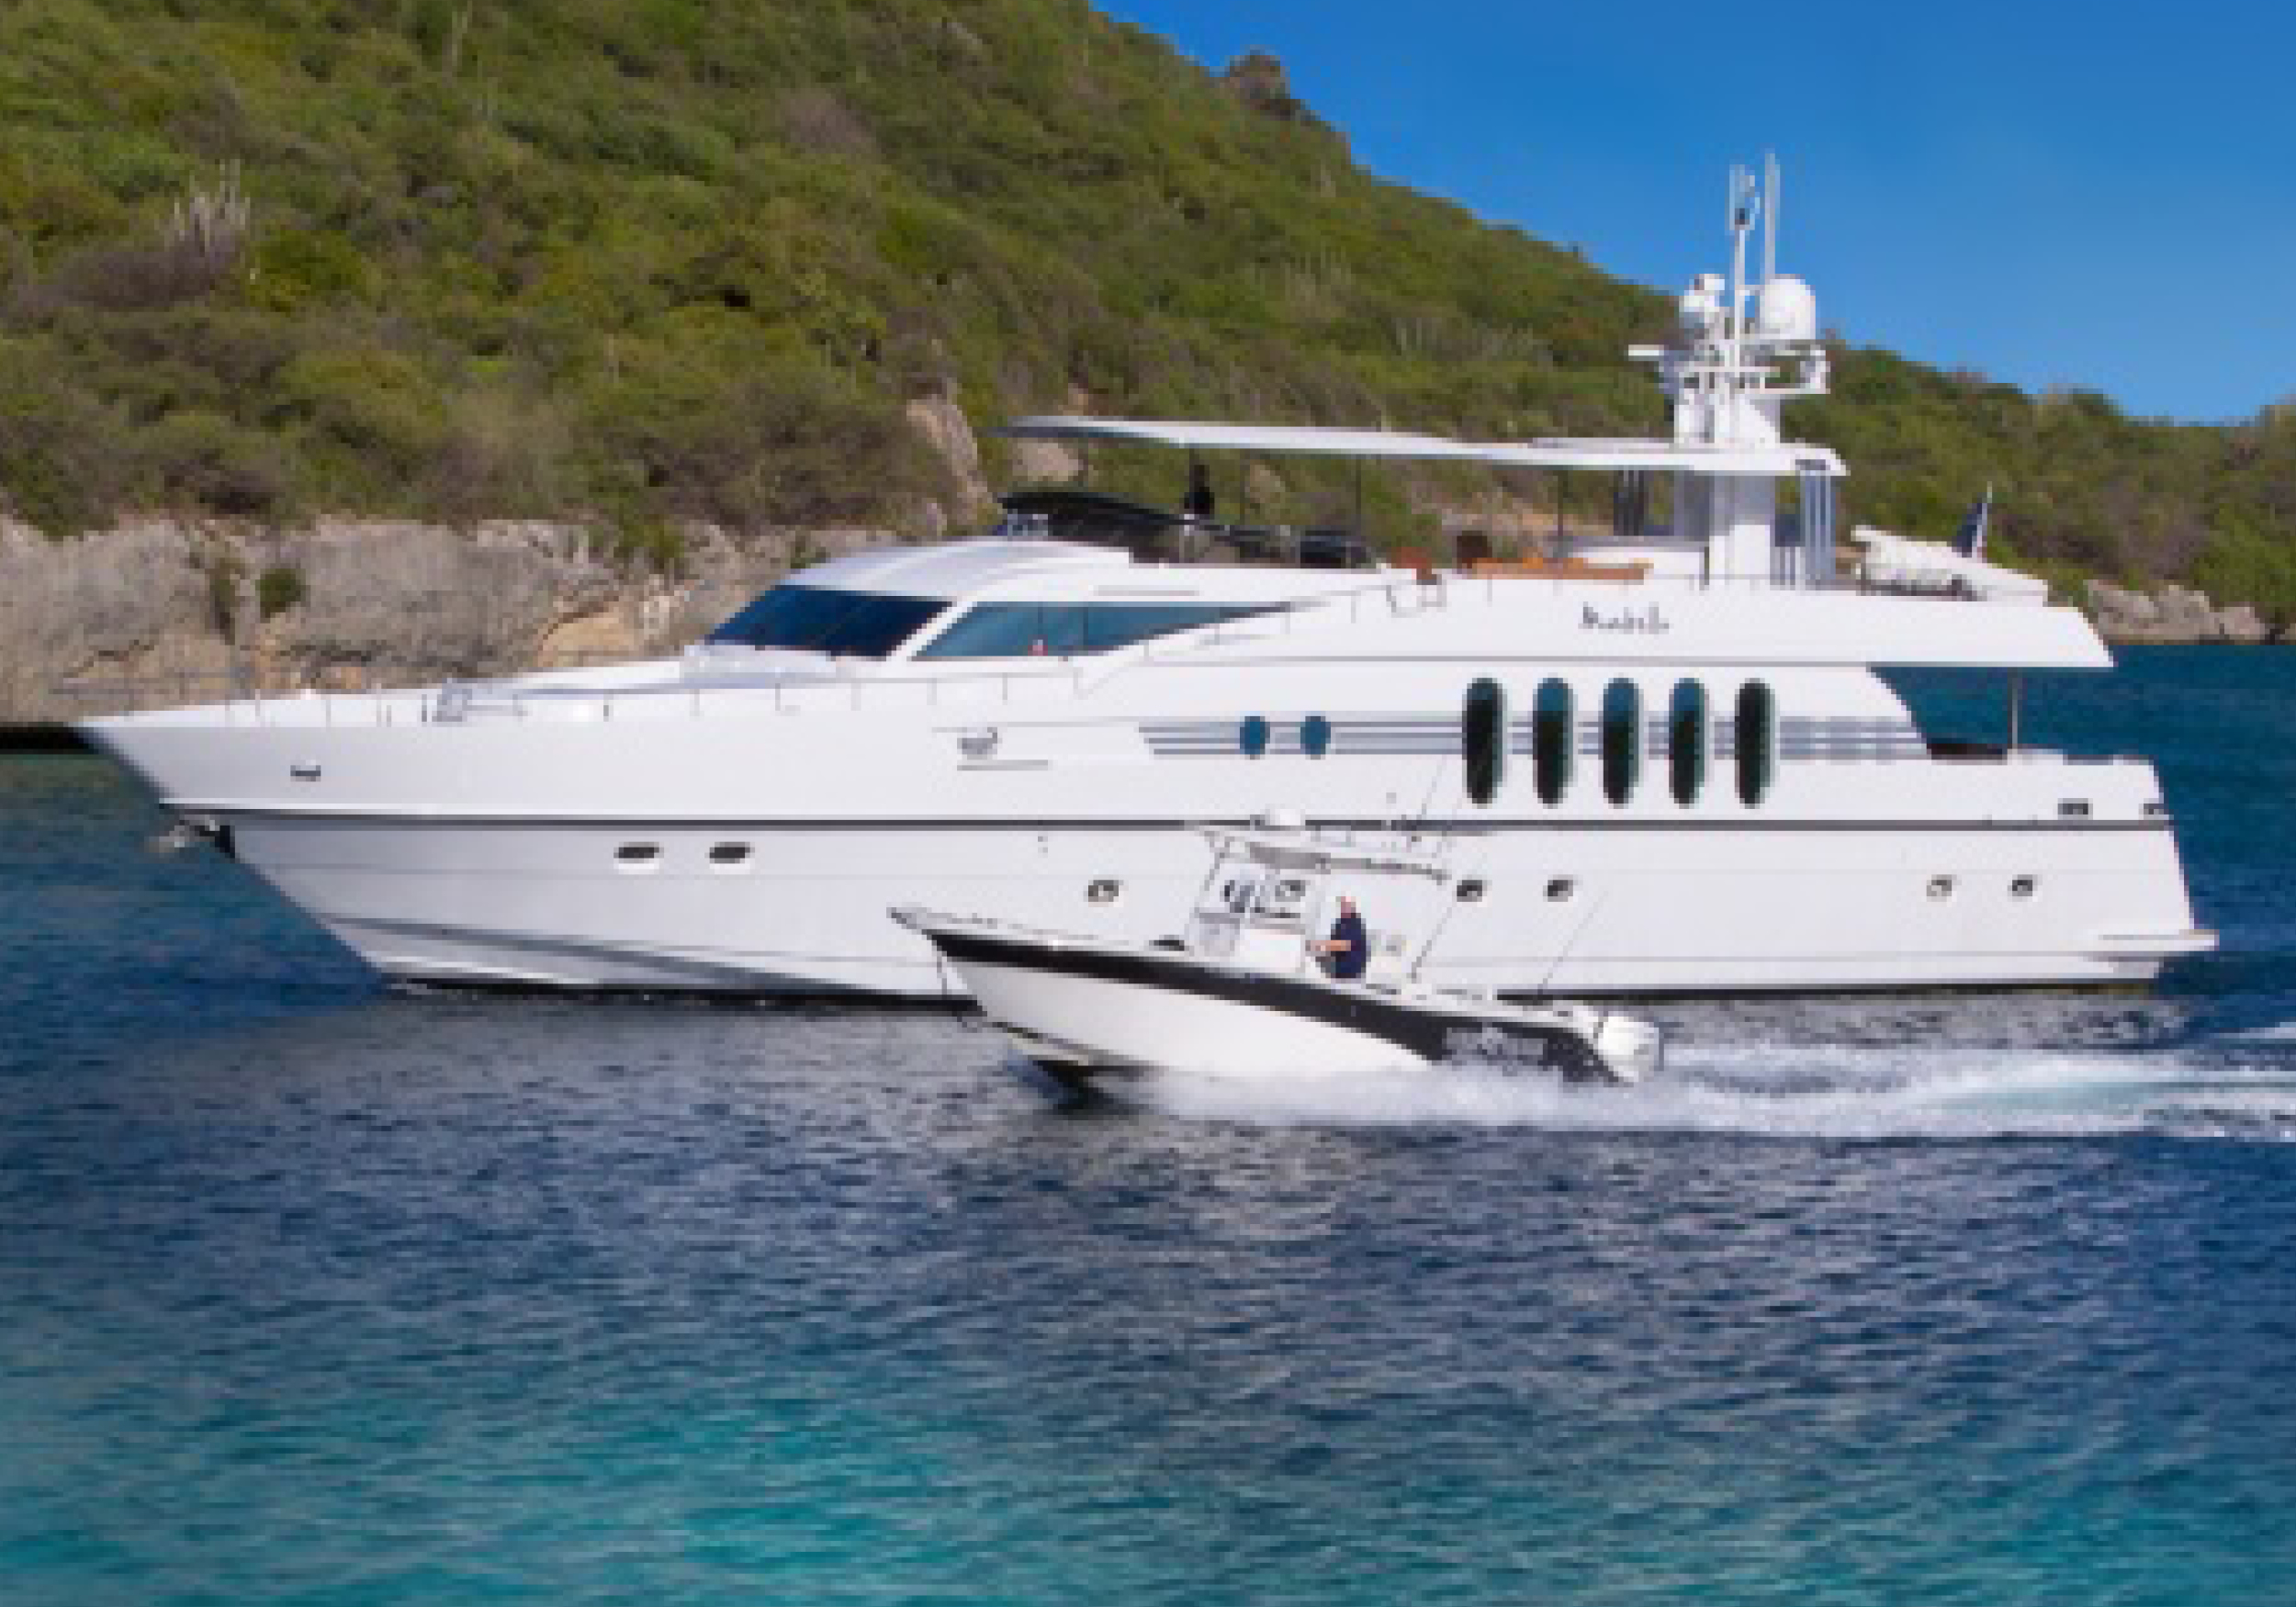 Karen-Lynn-Interior-Design-Yacht-Marbella-1.jpg